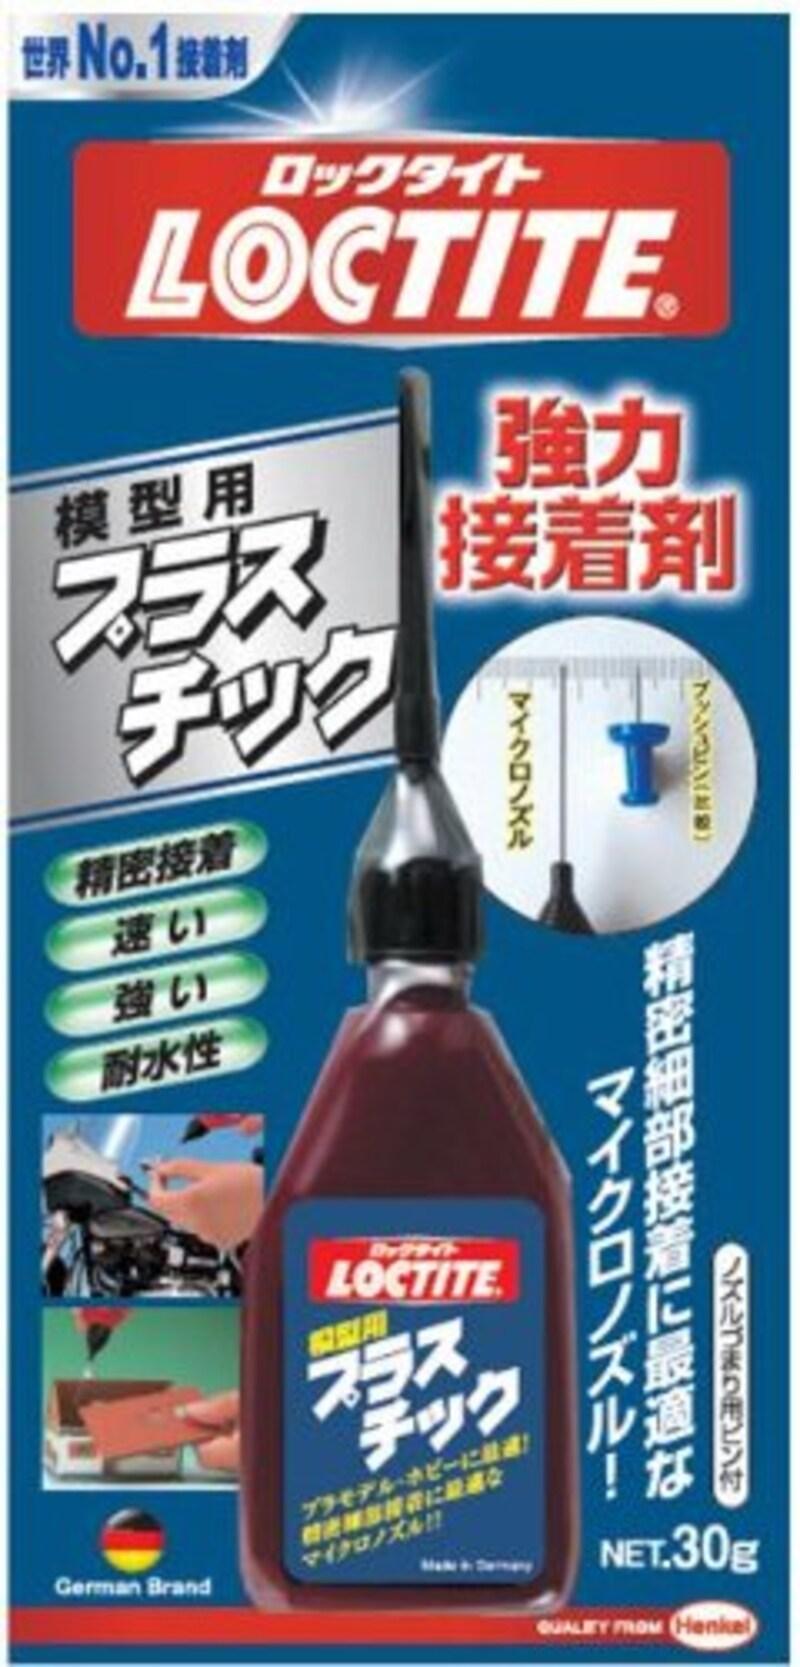 Henkel Japan(ヘンケルジャパン),LOCTITE(ロックタイト) 強力接着剤 模型用プラスチック,DPL-030